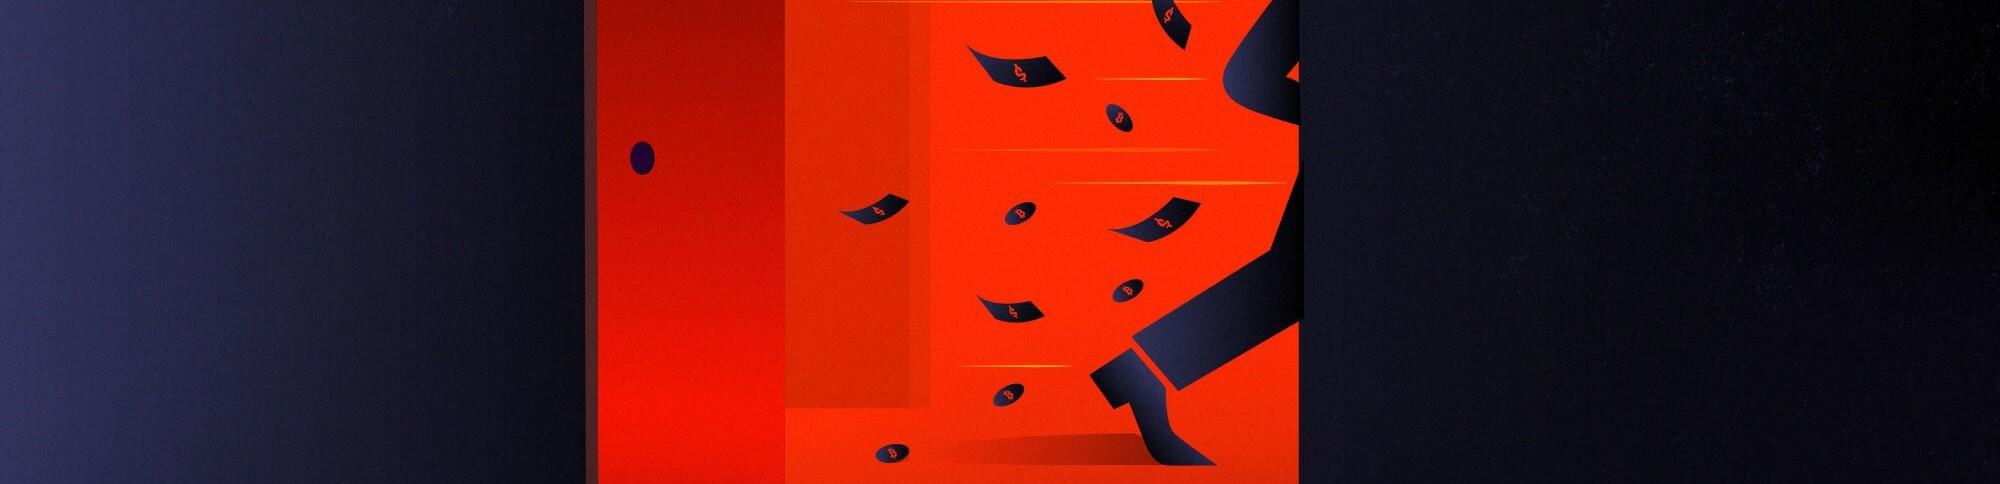 dark web state 02 - Exit scam? Биржа IDAX приостановила вывод средств в связи с пропажей CEO